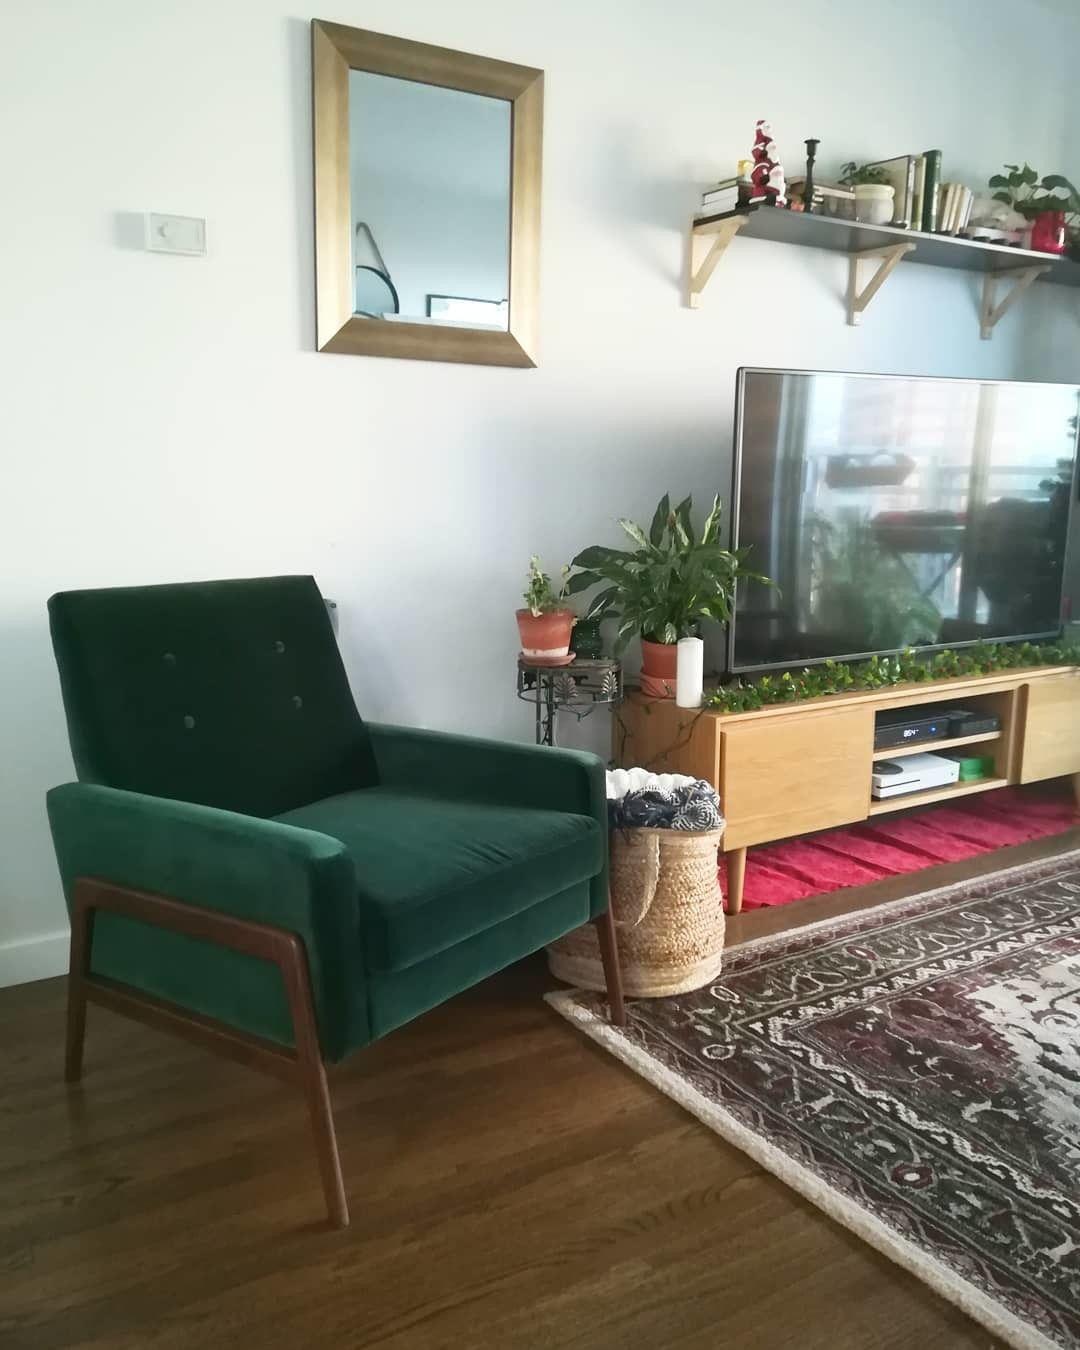 Nord Balsam Green Chair Green chair, Best high chairs